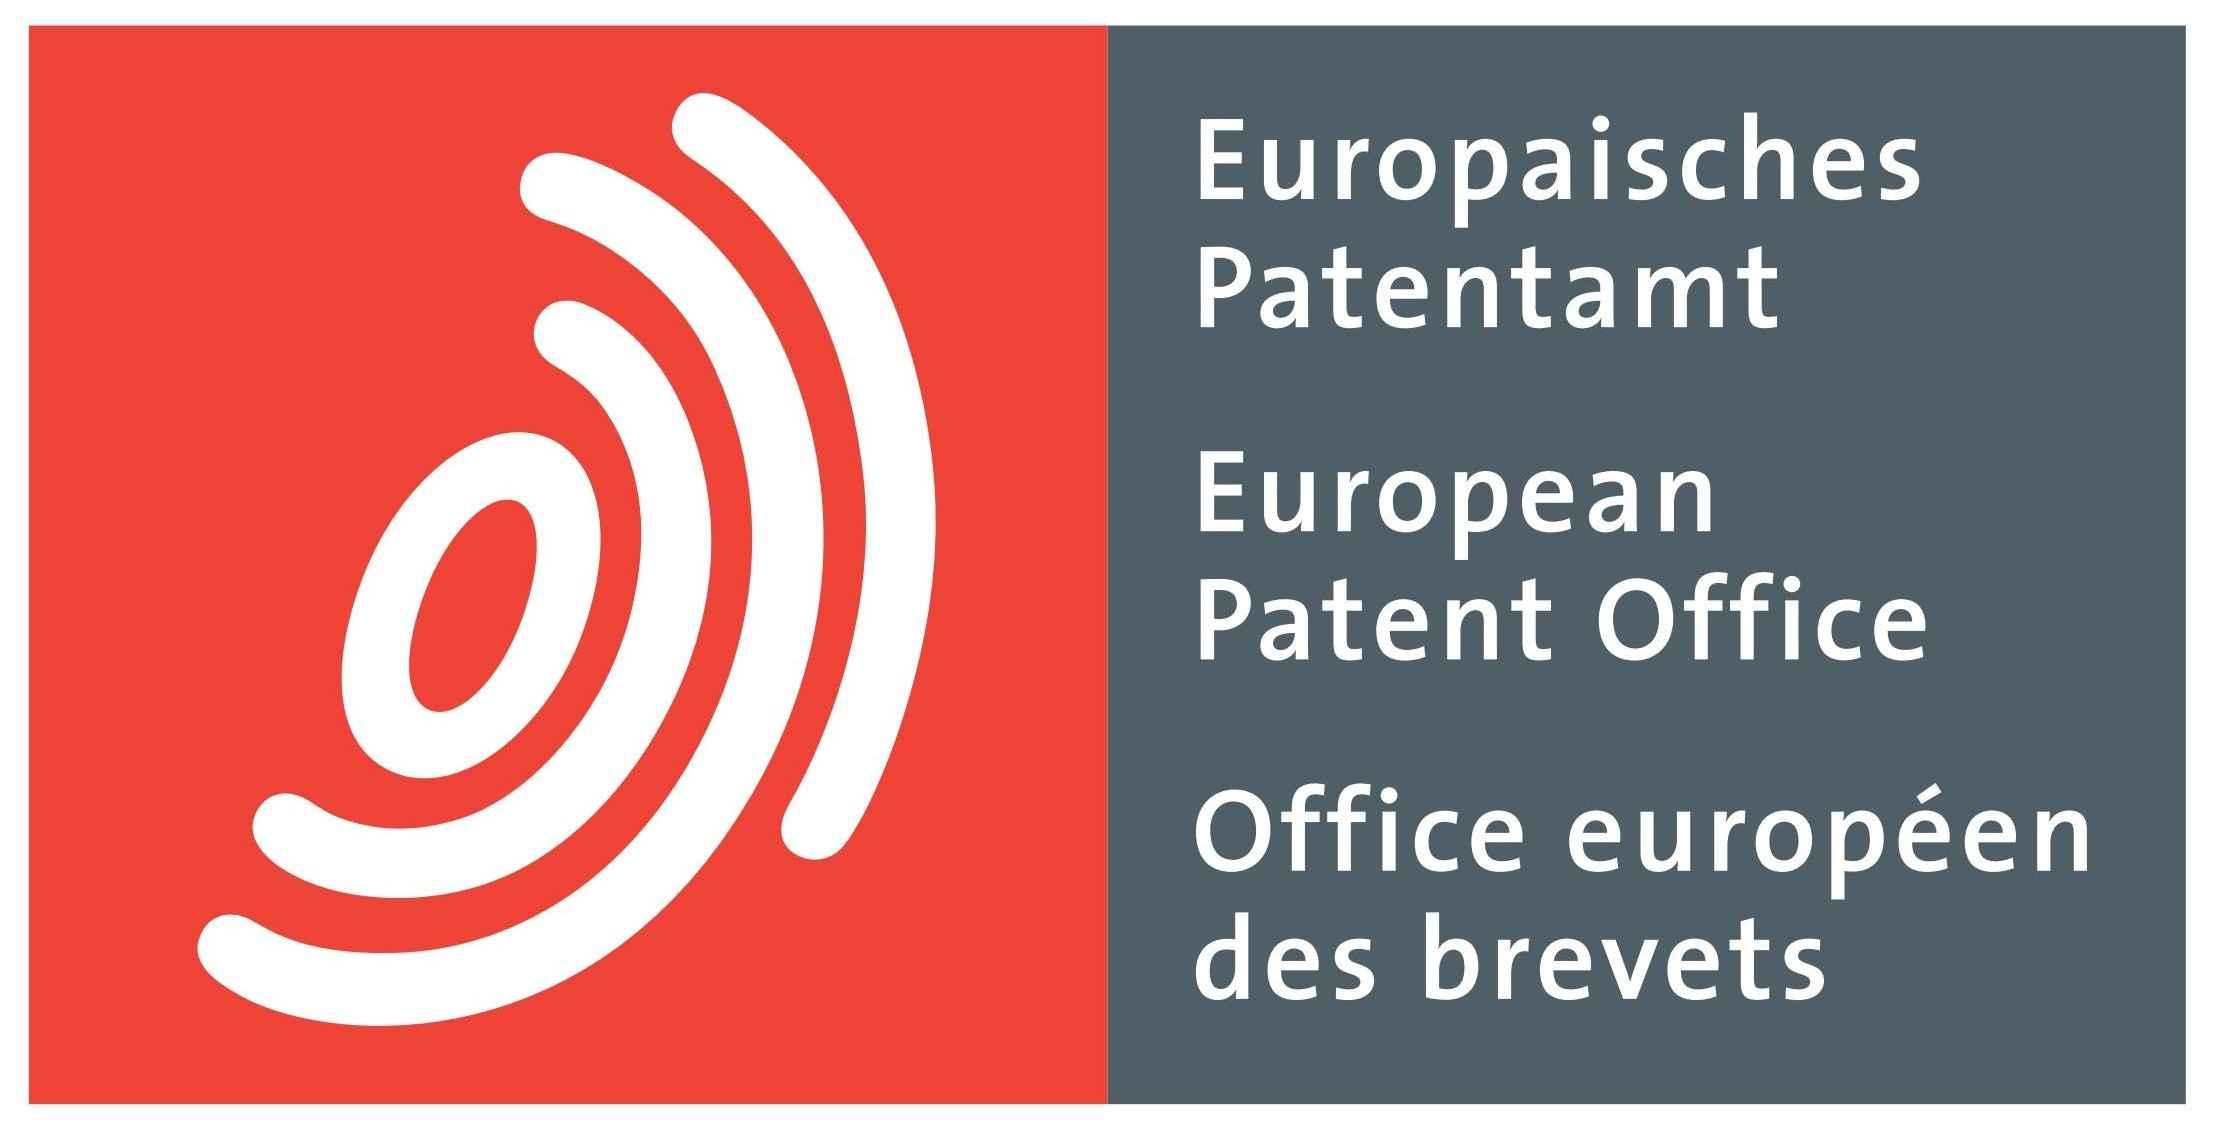 epo european patent organisation logo